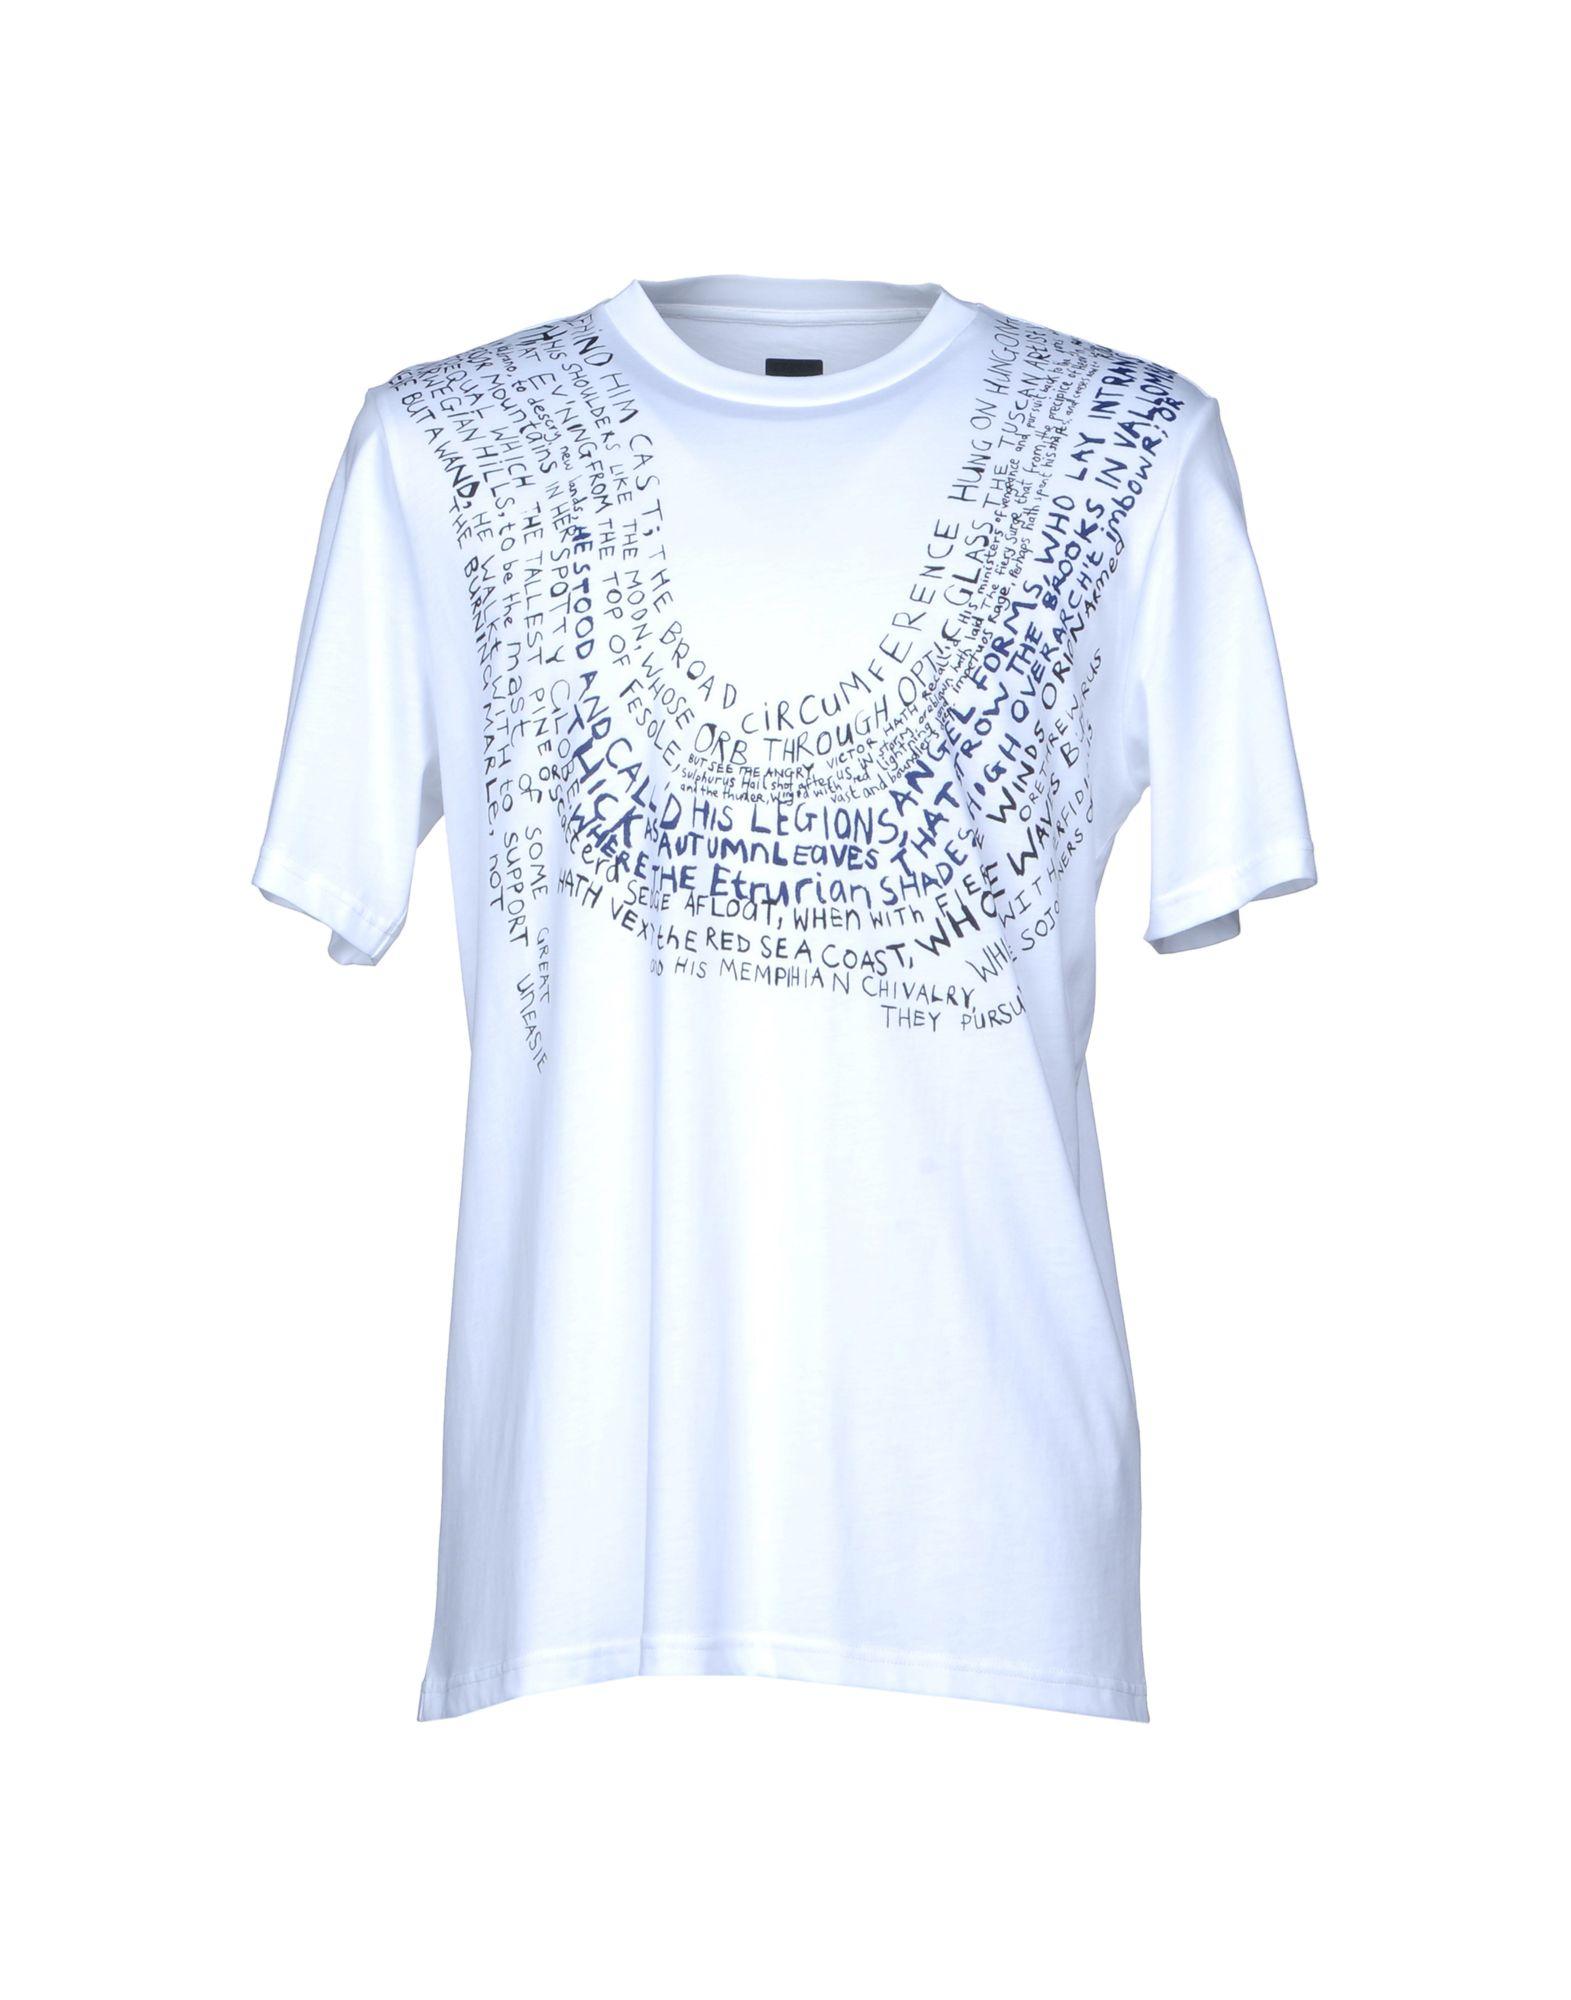 A buon mercato A buon mercato mercato buon T-Shirt Oamc Uomo - 12075255NW 0fe2ac